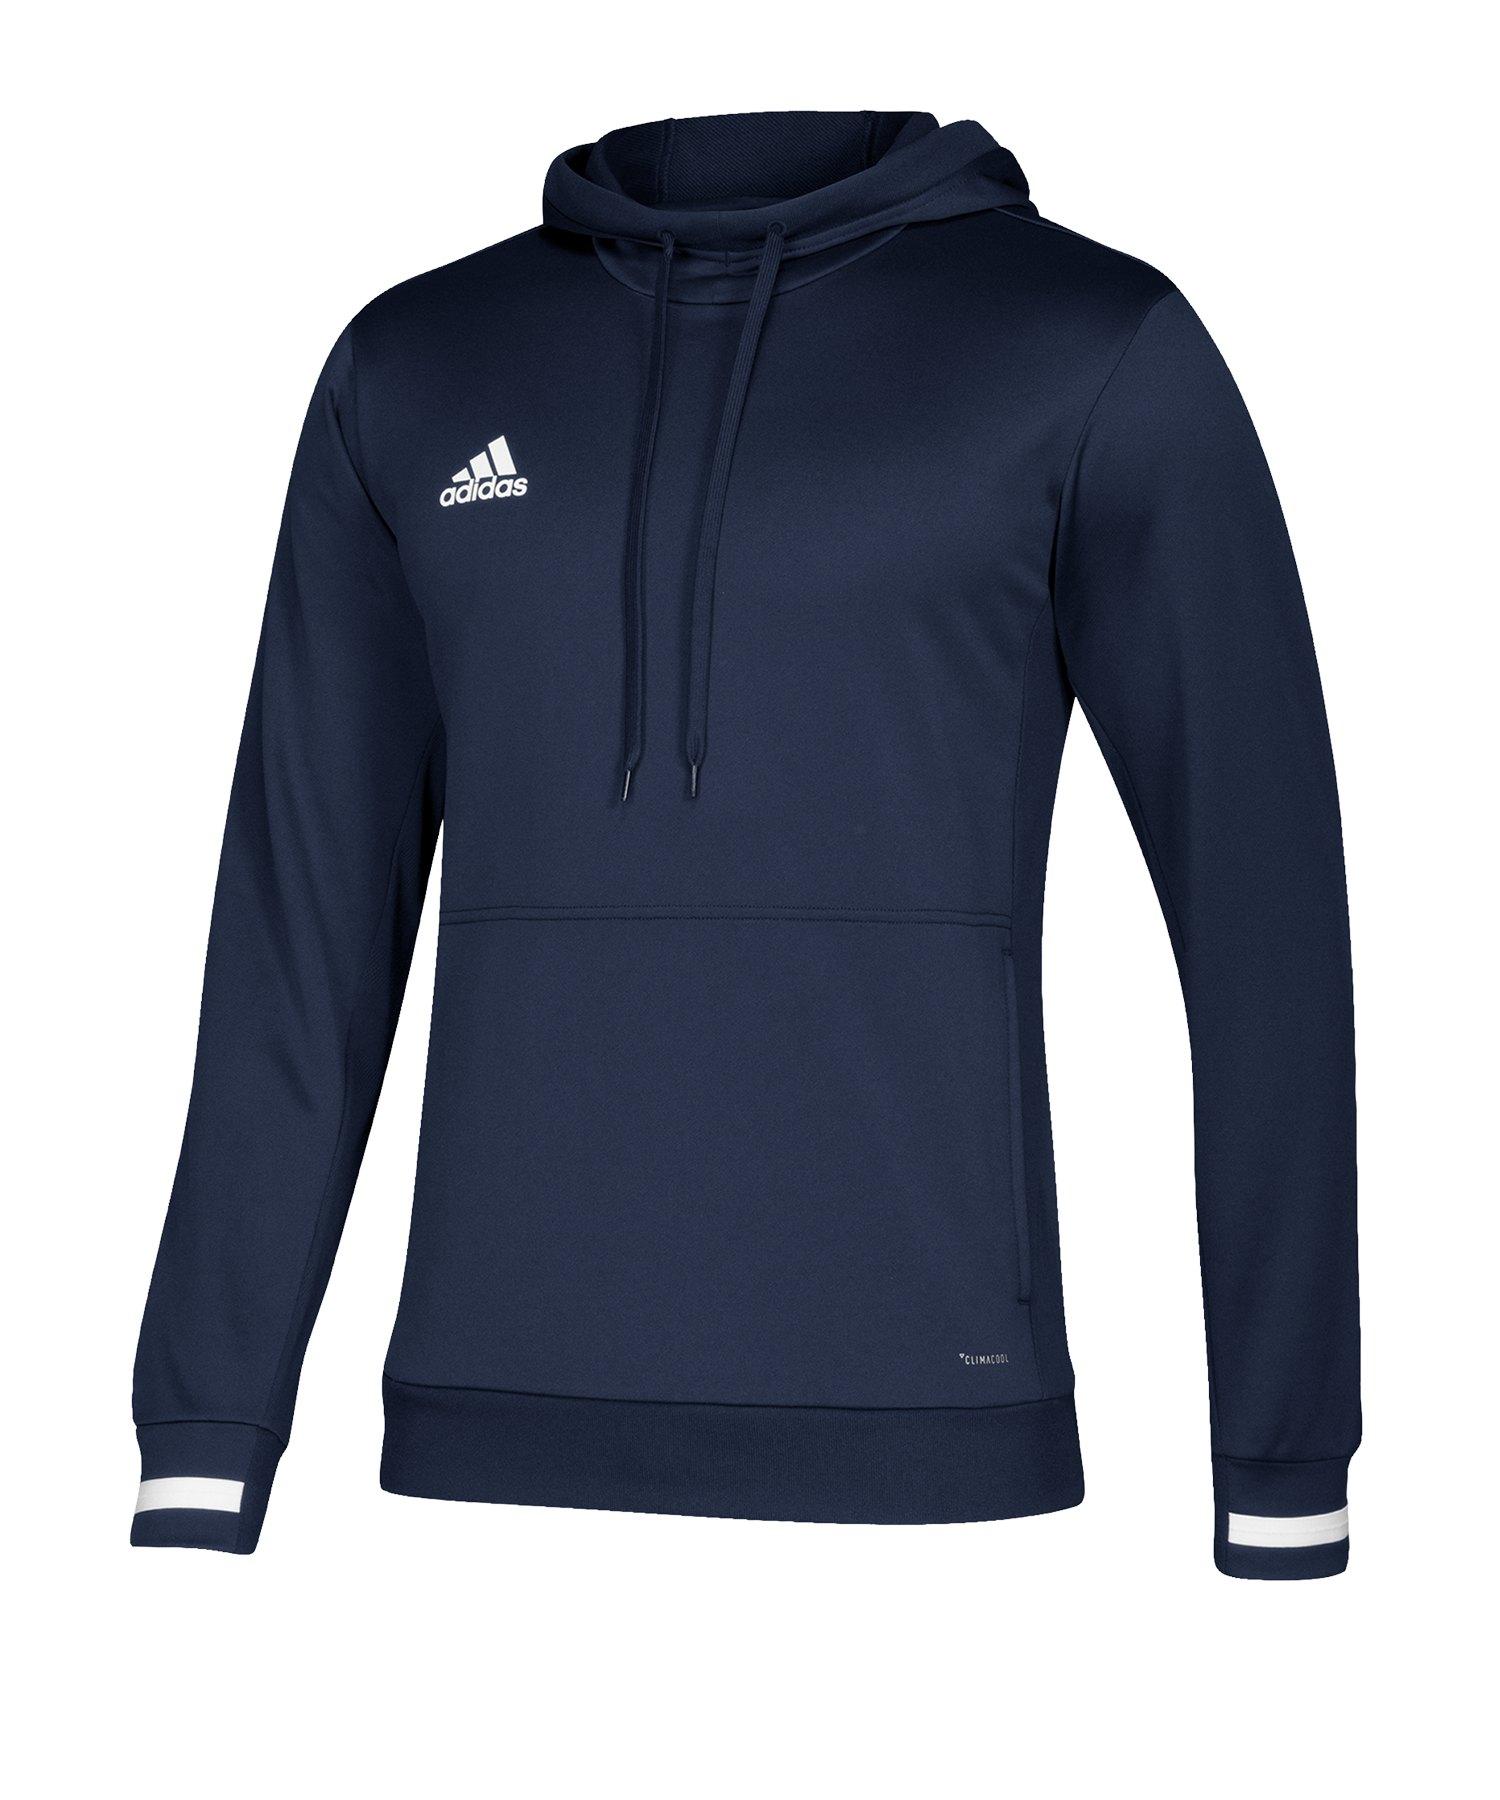 adidas Team 19 Kapuzensweatshirt Blau Weiss - blau